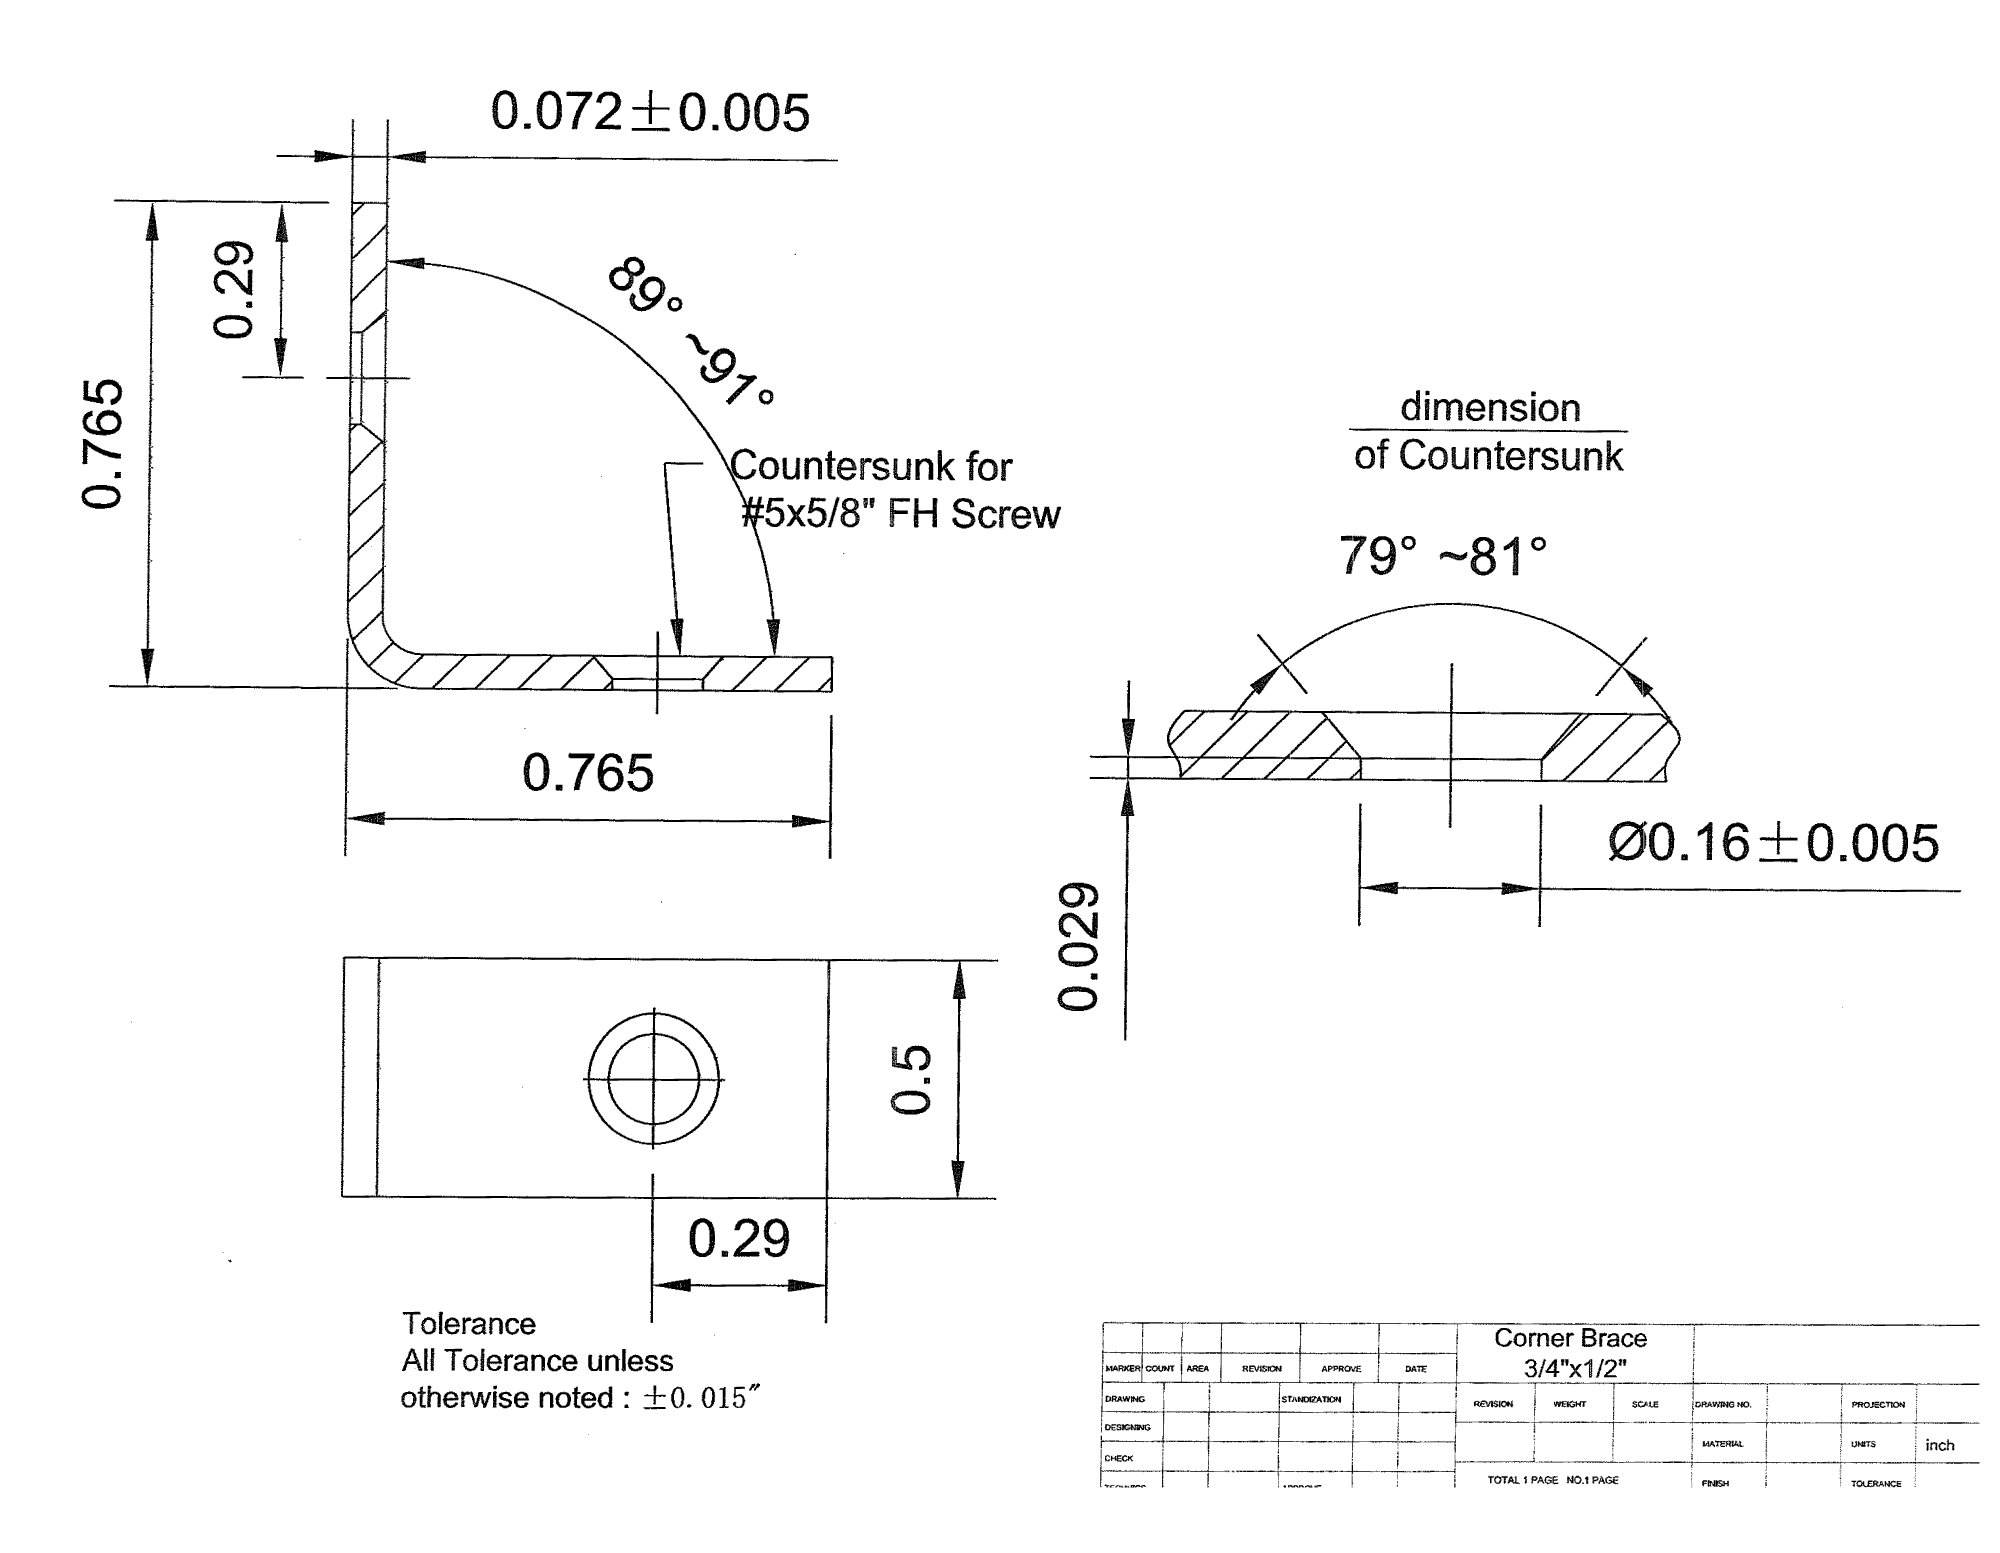 20 Pack 3/4'' x 3/4'' x 1/2'' wide 14 Gauge (5/64'' thick) | Super Heavy Duty Hot-Dip Galvanized Zinc Coated Corner Brace L Bracket | 1/2 Inch Wide, 3/4 Inch High and Long